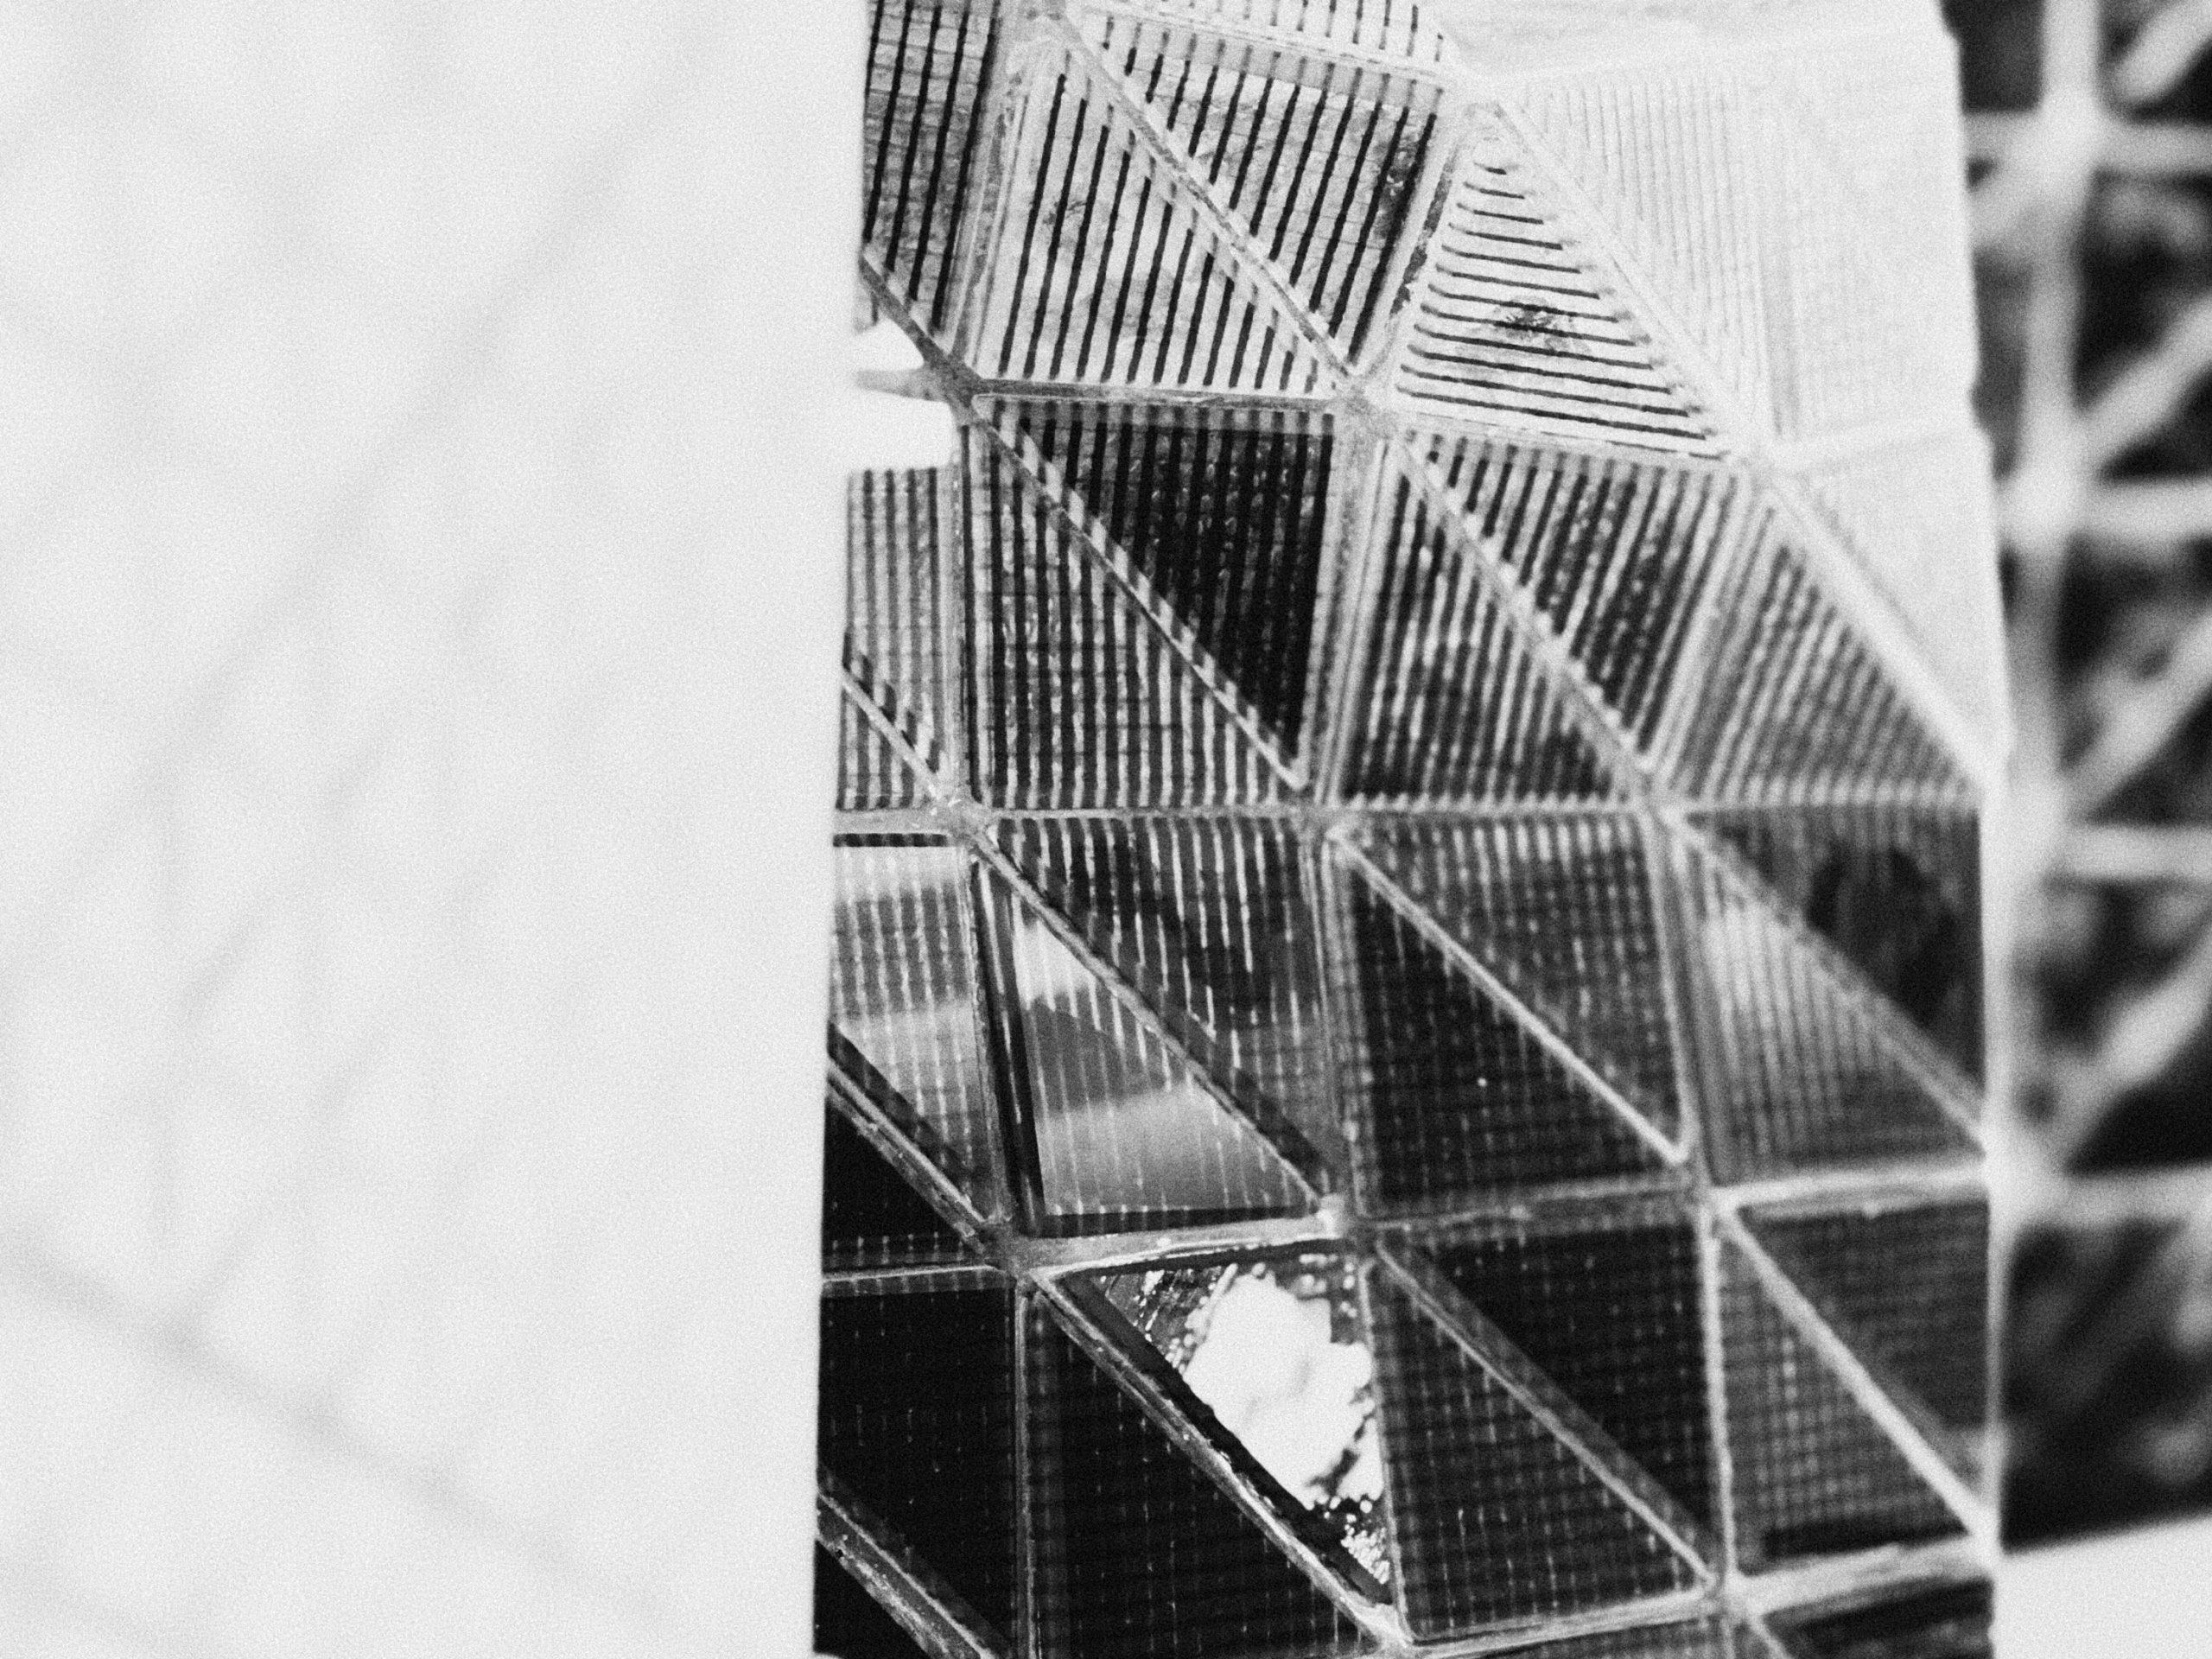 Matteo Silverio – Venice : Virtual bodies as a measure of architecture